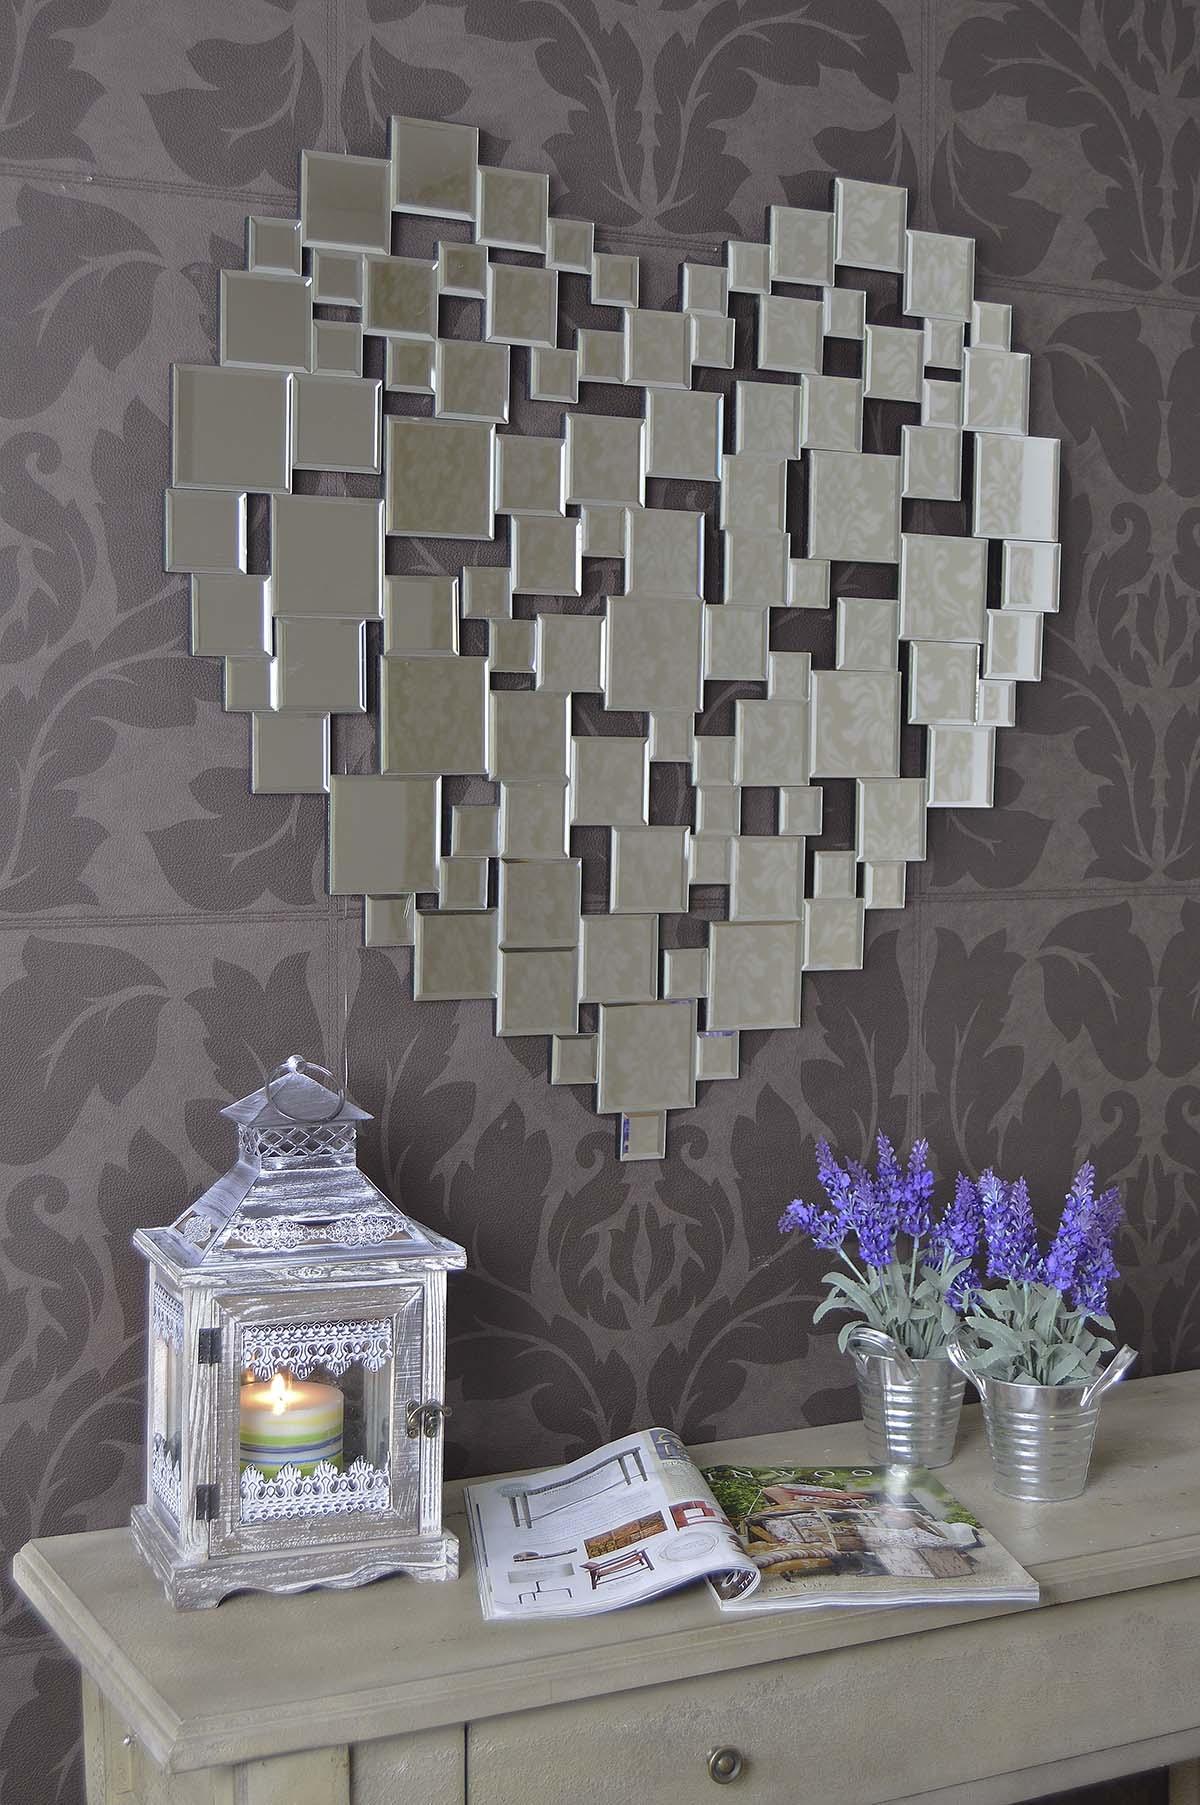 15 Heart Wall Mirror  Mirror Ideas